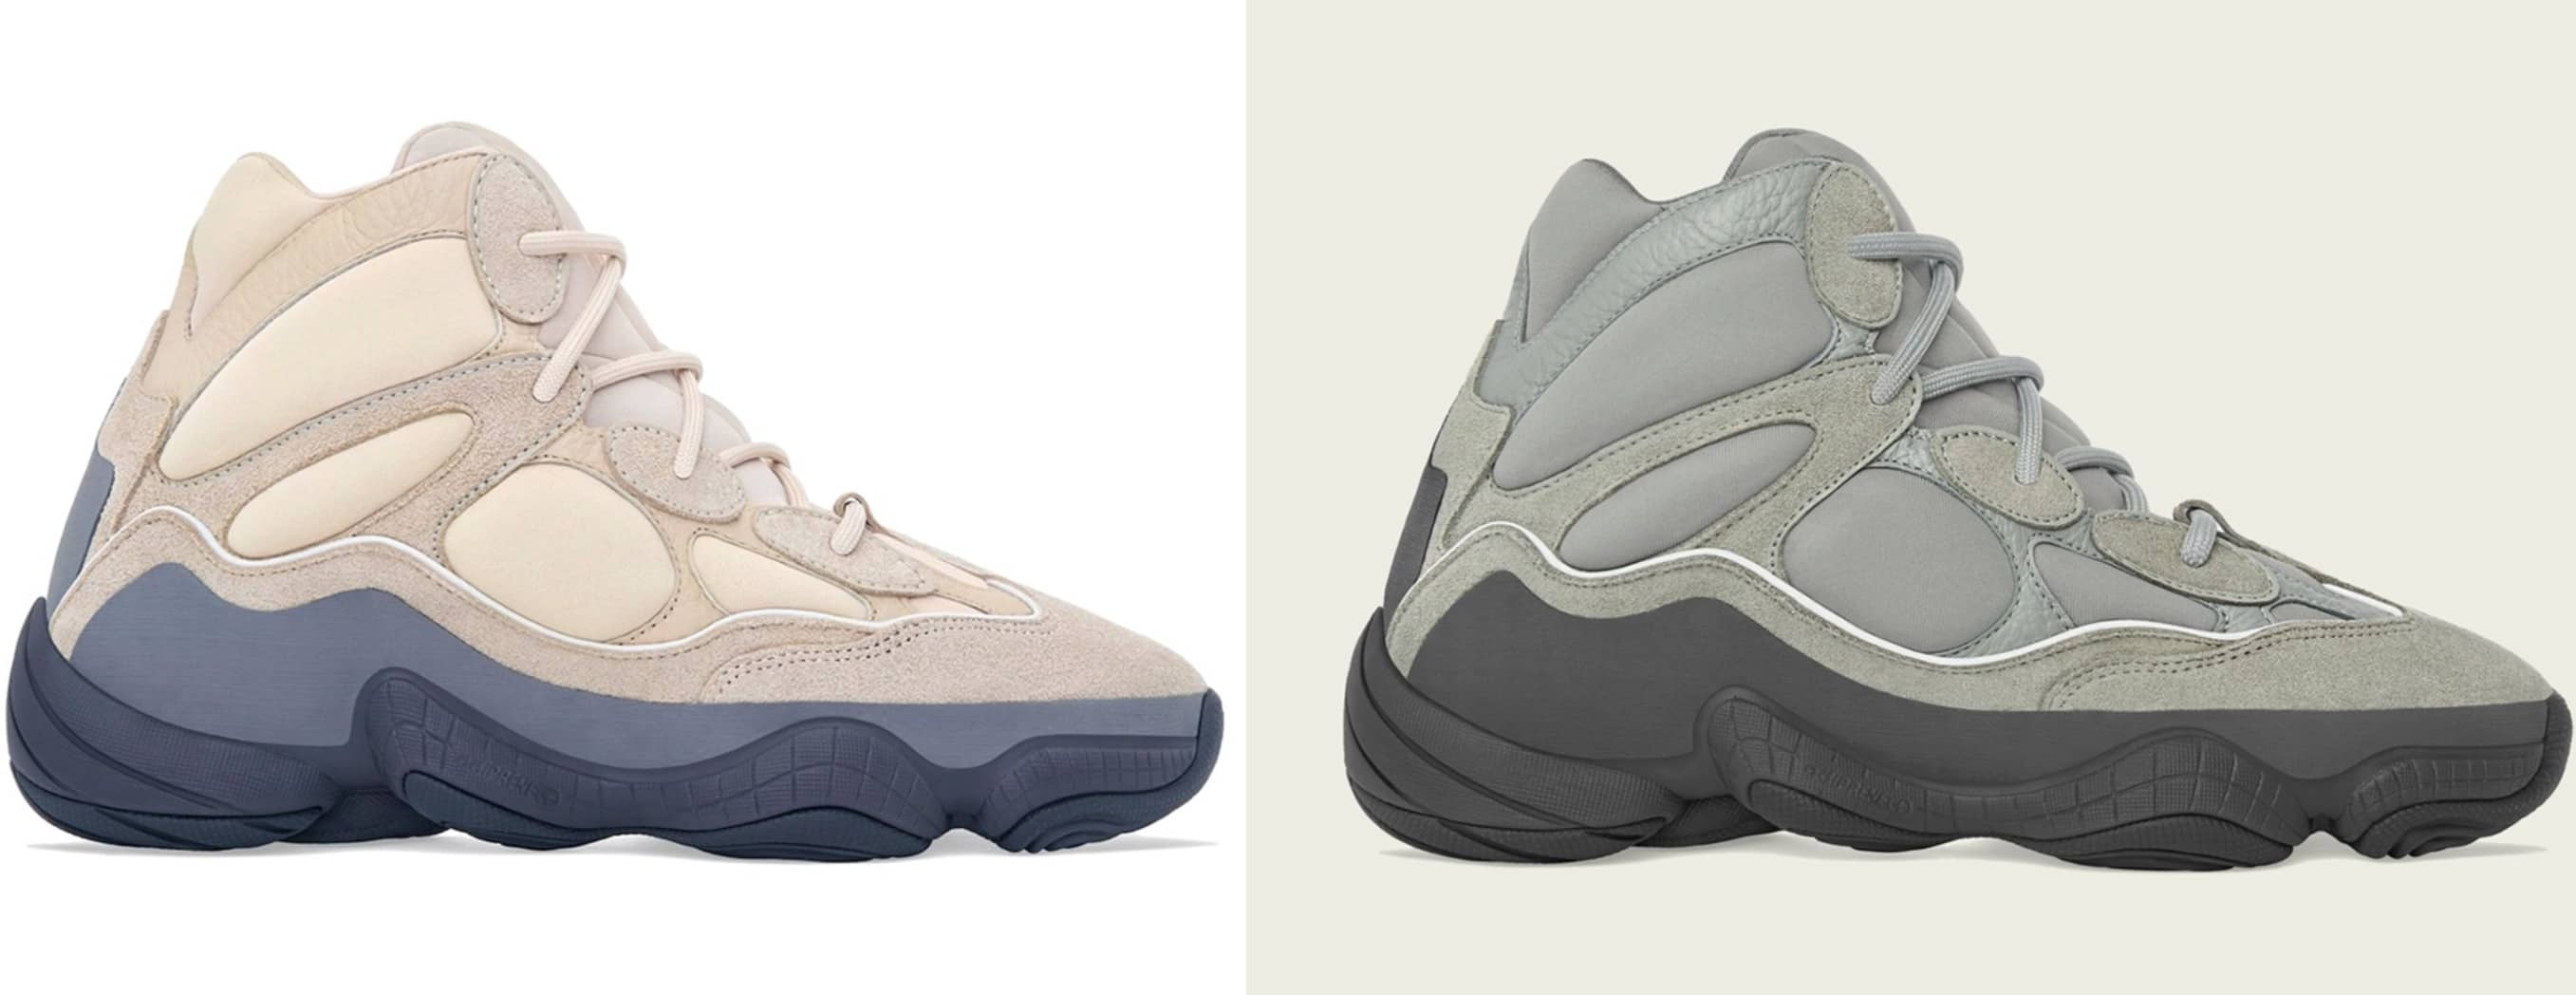 "adidas YEEZY 500 High ""Wakaran"" - YEEZY 500 High ""Mist Slate"""